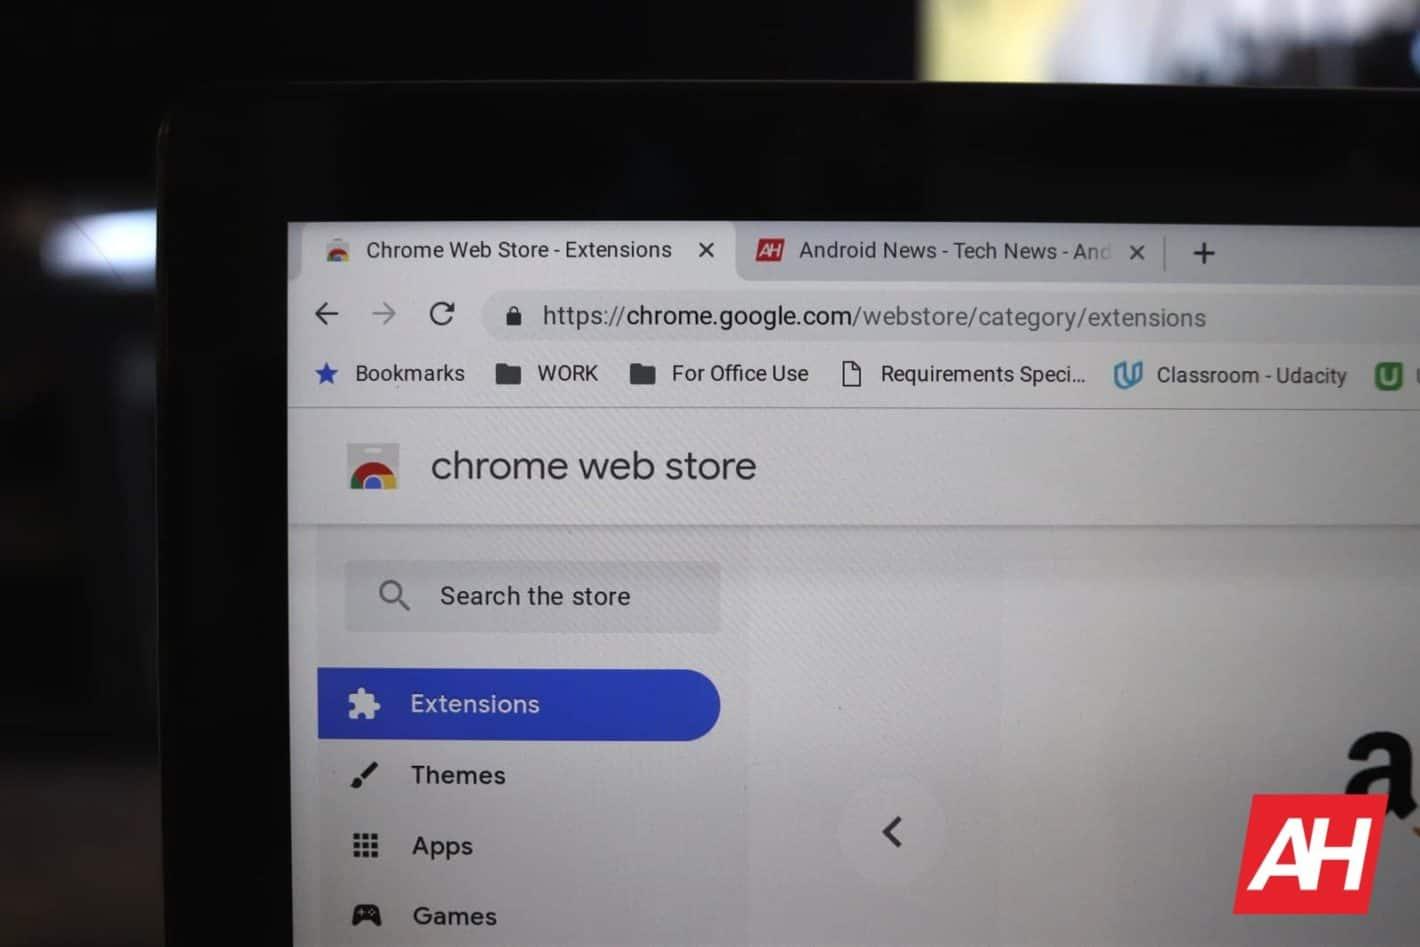 Chrome Web Store Extensions AH 2019